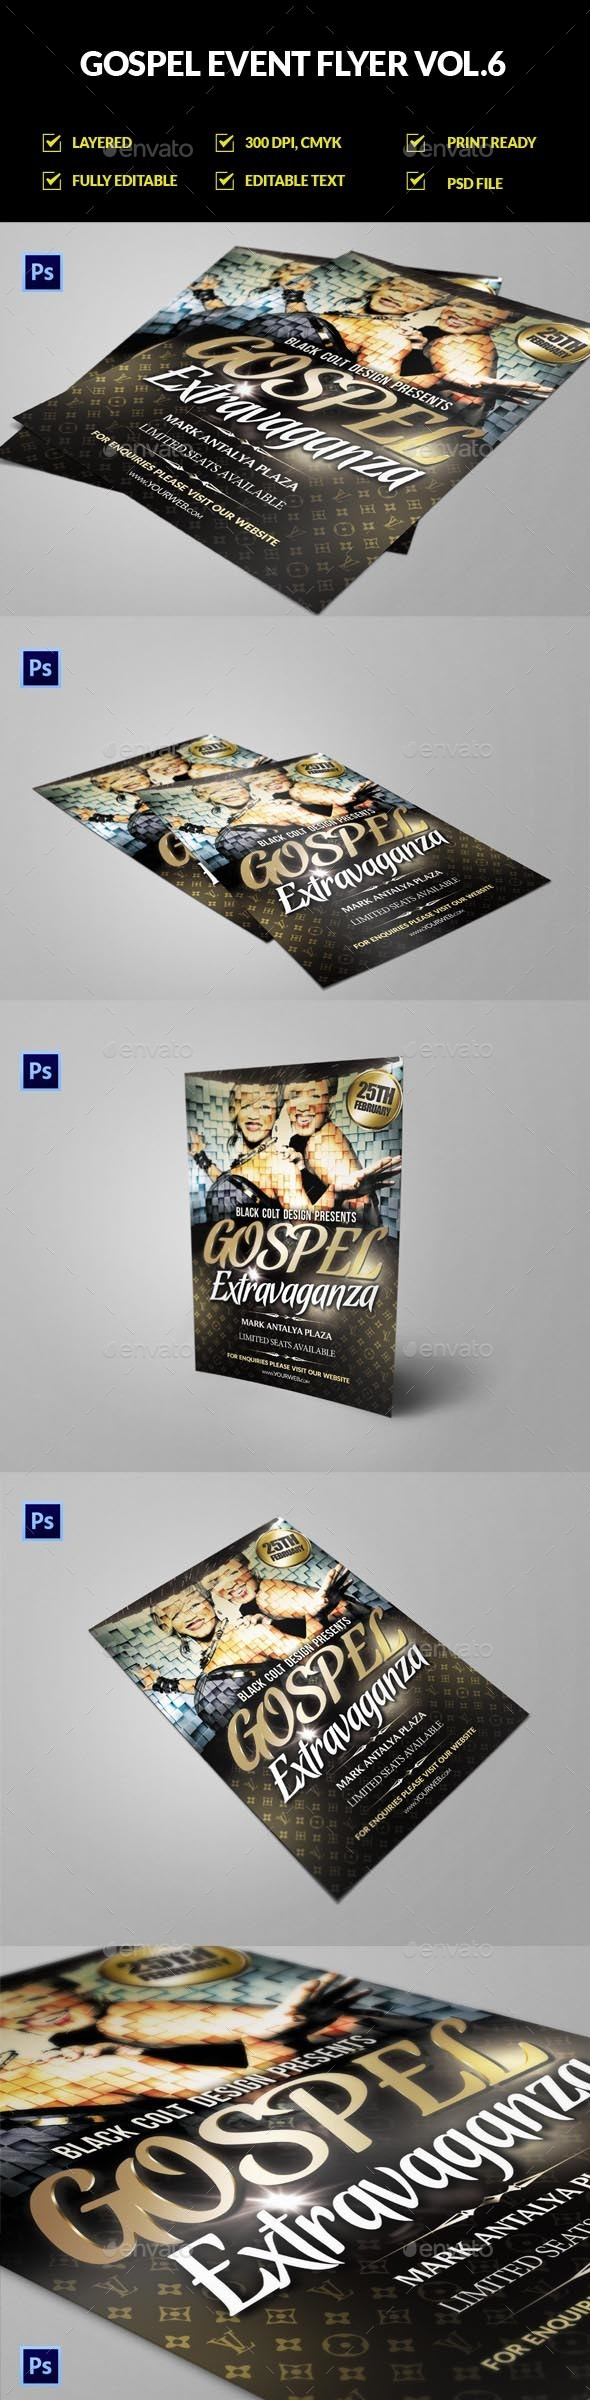 Gospel / Church Event Flyer Vol.6 - Church Flyers